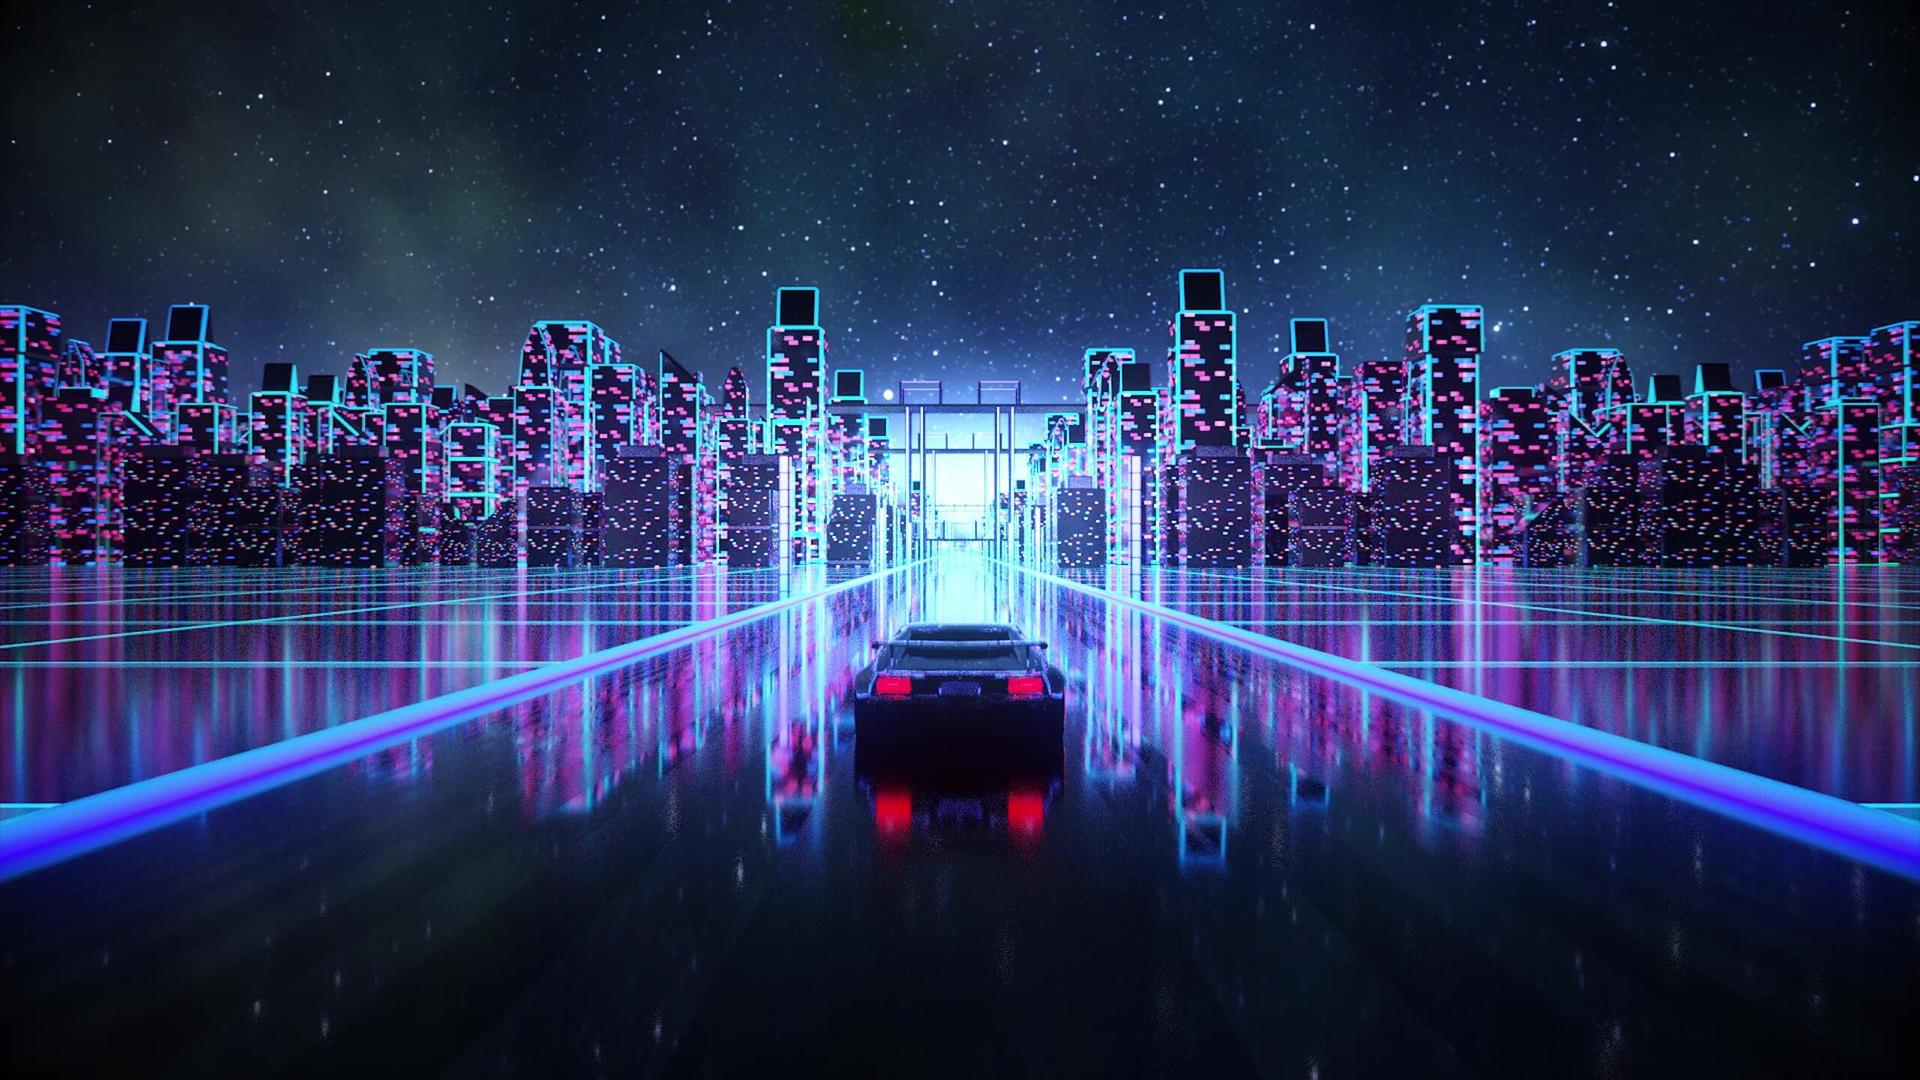 Outrun Trailblaze Car Live Wallpaper By Nightcoregang On Deviantart